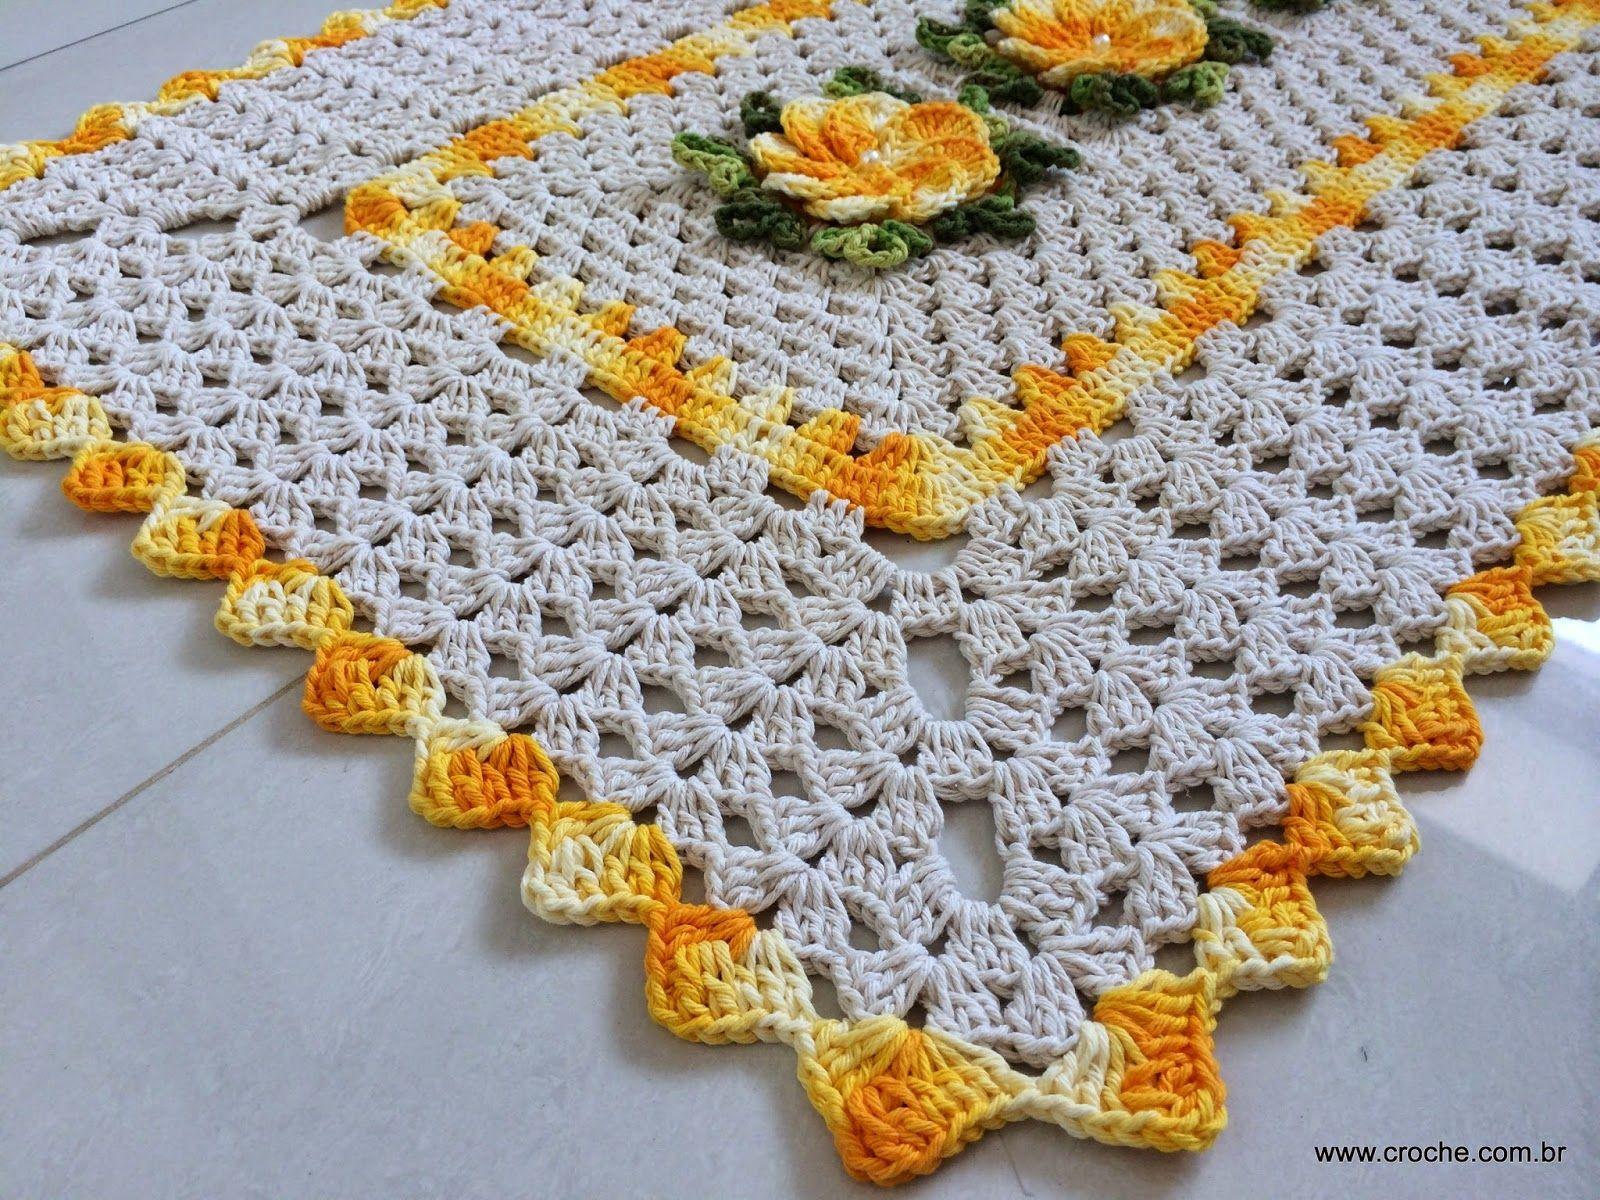 Tapete retangular passo a passo parte 1 crochet thread for Tapetes de crochet